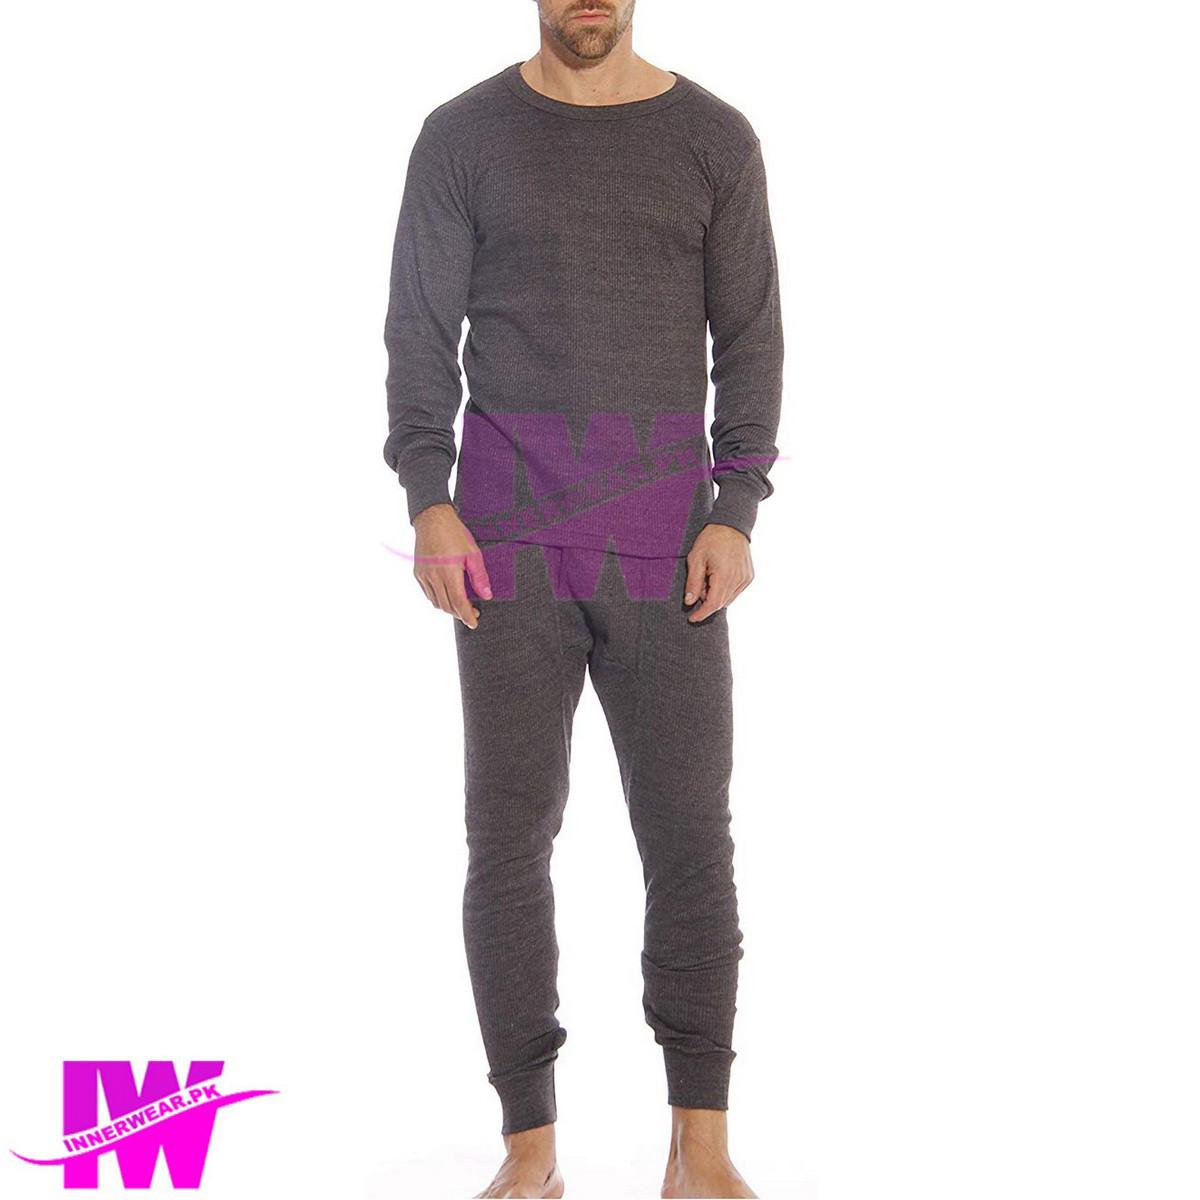 Men Premium Full Body Suit Thermal Body Warmer Skin Tight Stretchable Innerwear Winter Warm Long Johns Trouser Pajama Full Sleeve Shirt Dark Grey Full Bazoo innerwear pk